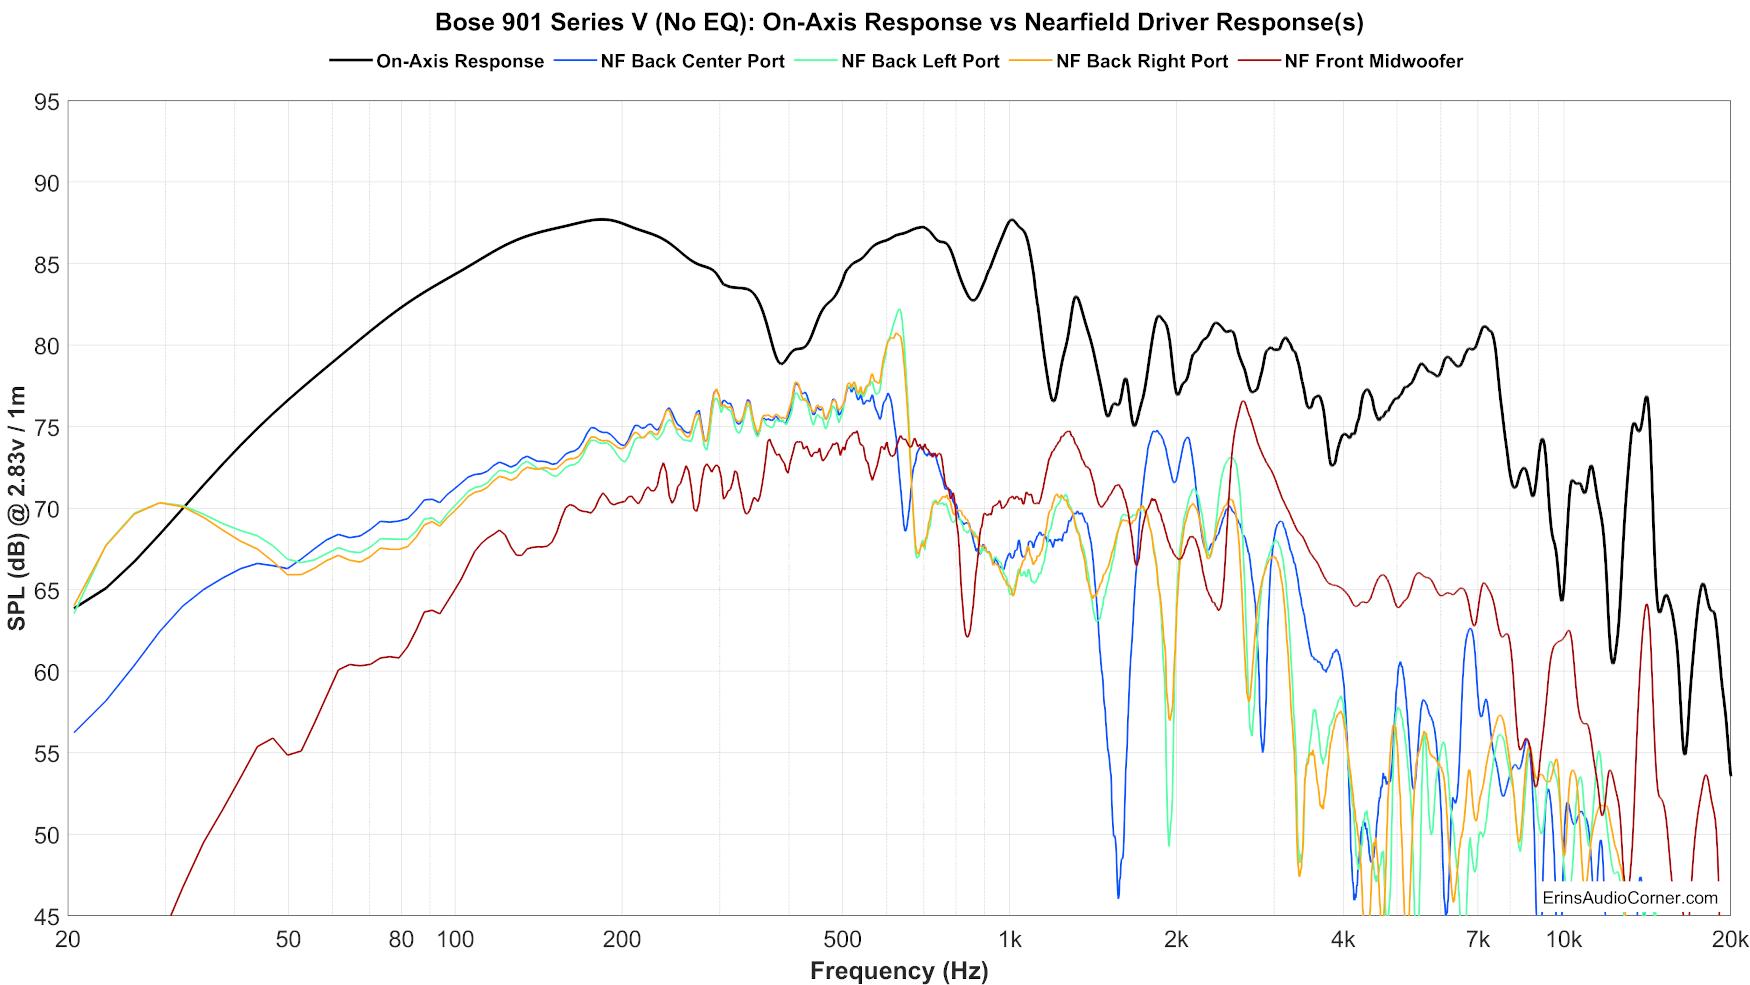 Bose%20901%20Series%20V%20(No%20EQ)%20Nearfield.png